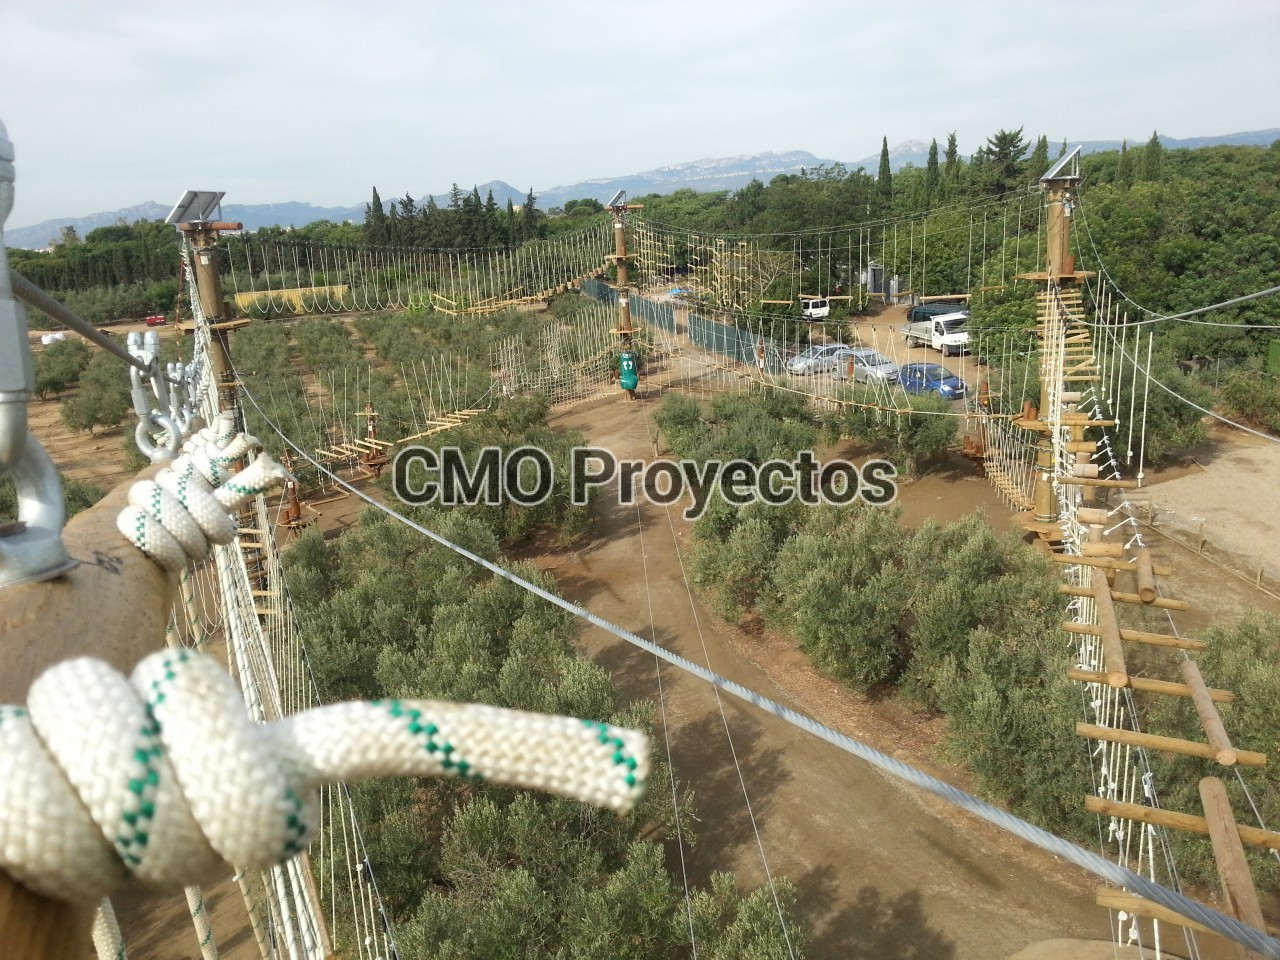 Parc Jumpland Aventura en Parque Multiaventura CMO Proyectos